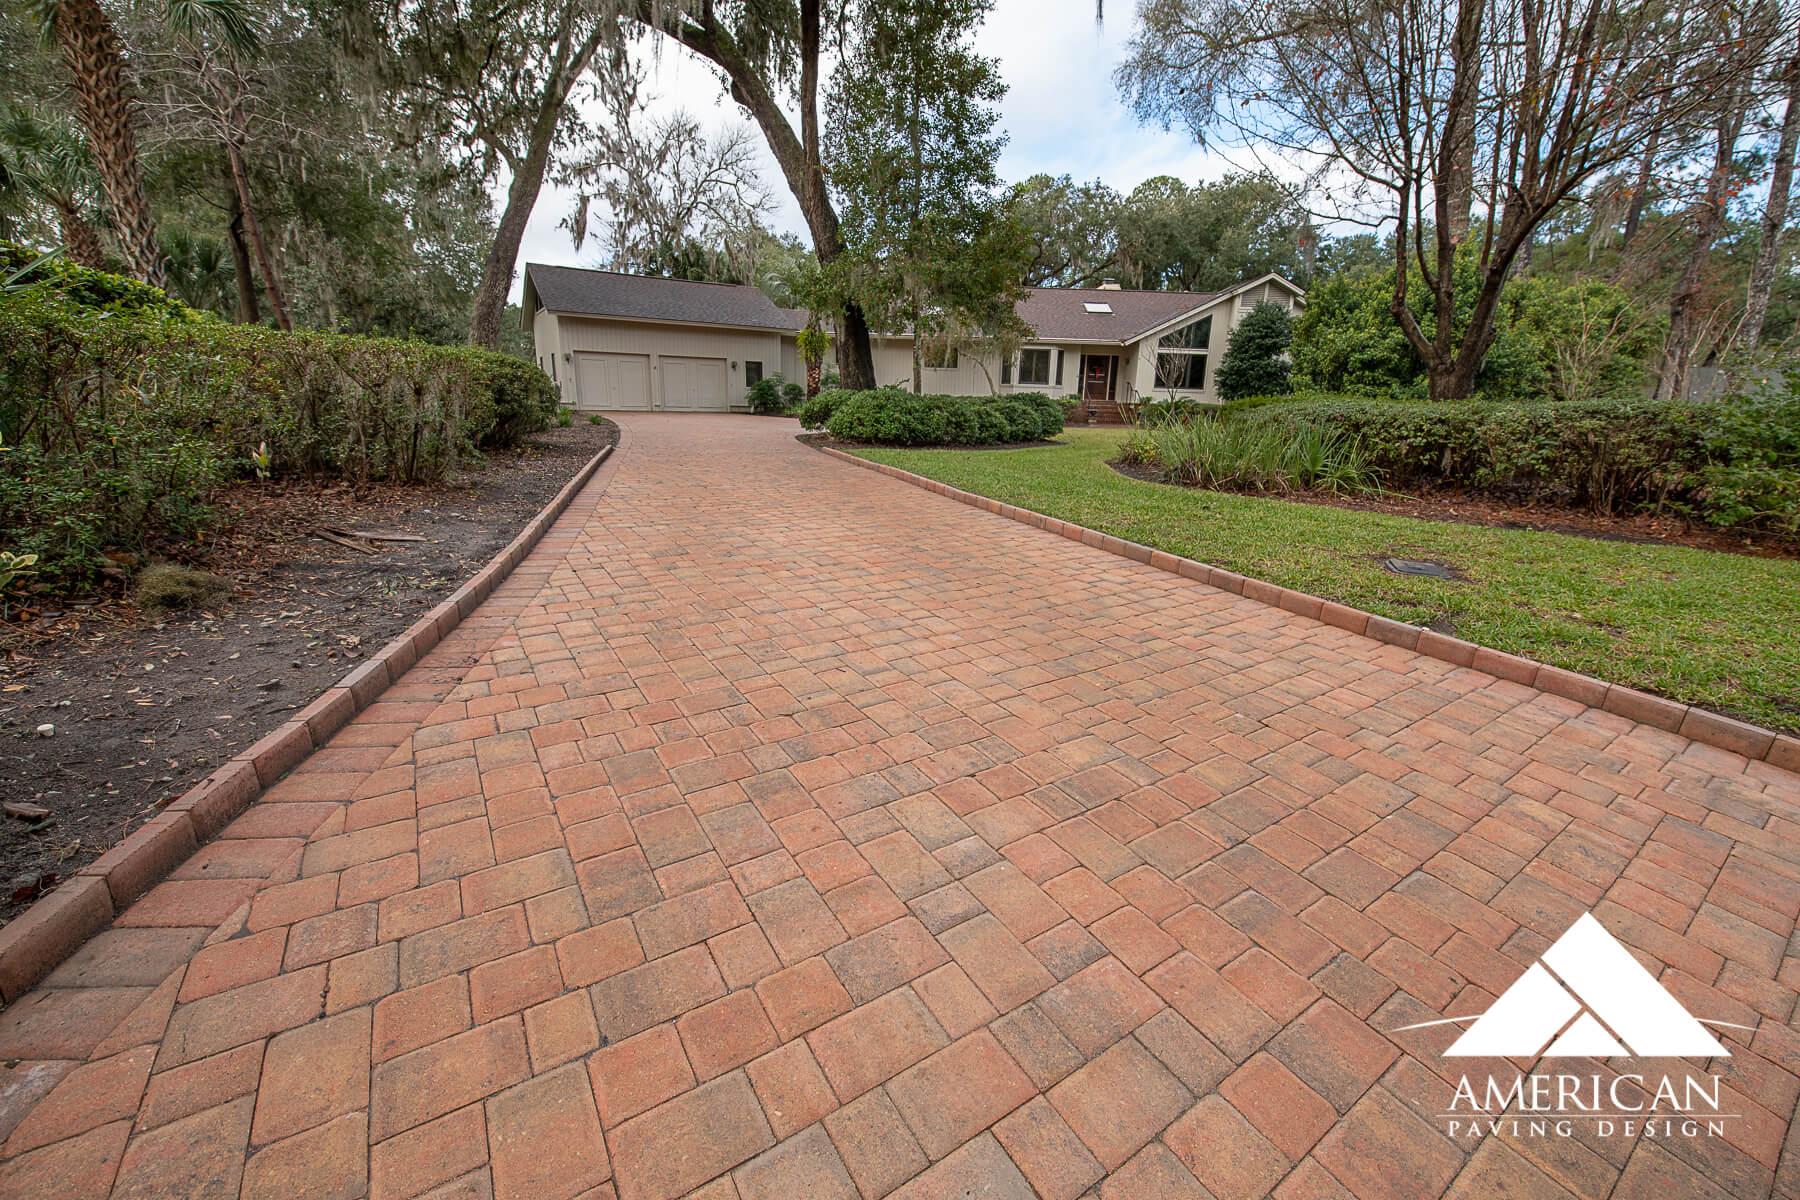 Red Brick Paver Driveway Design